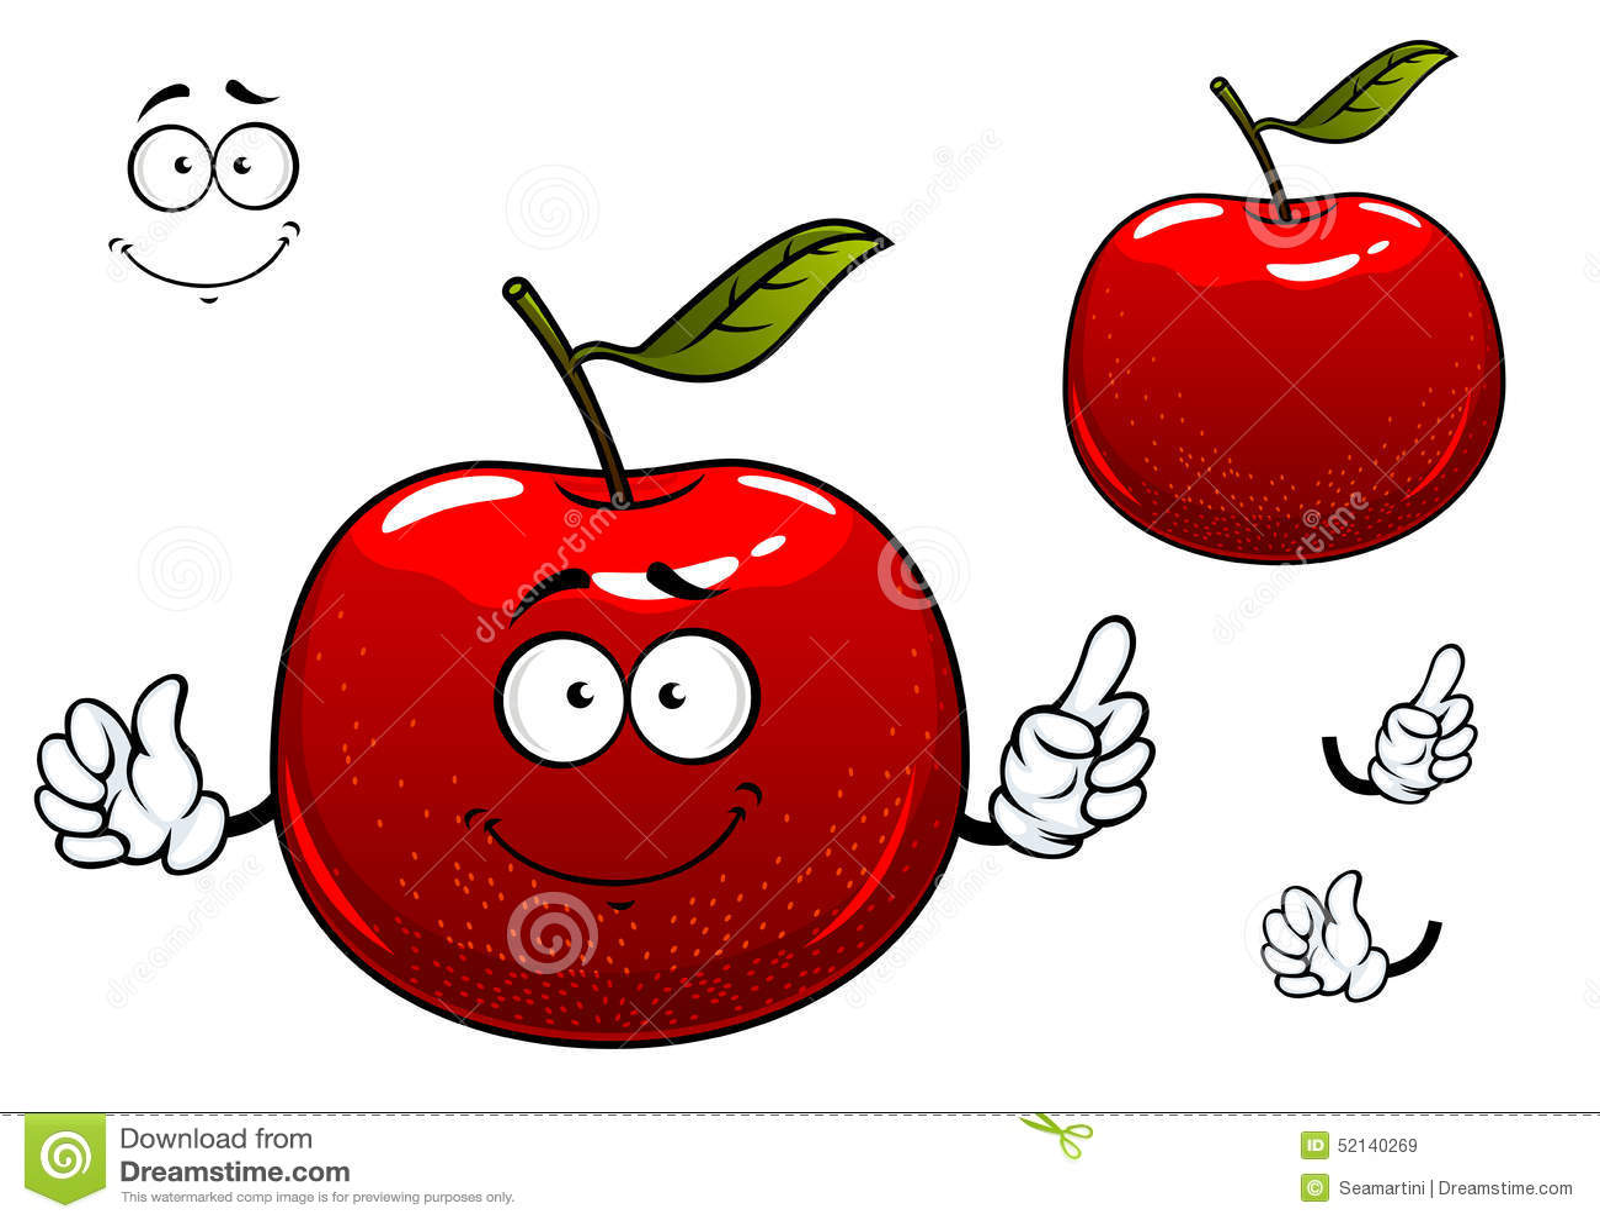 Personaje De Dibujos Animados Crujiente Rojo De La Fruta De La